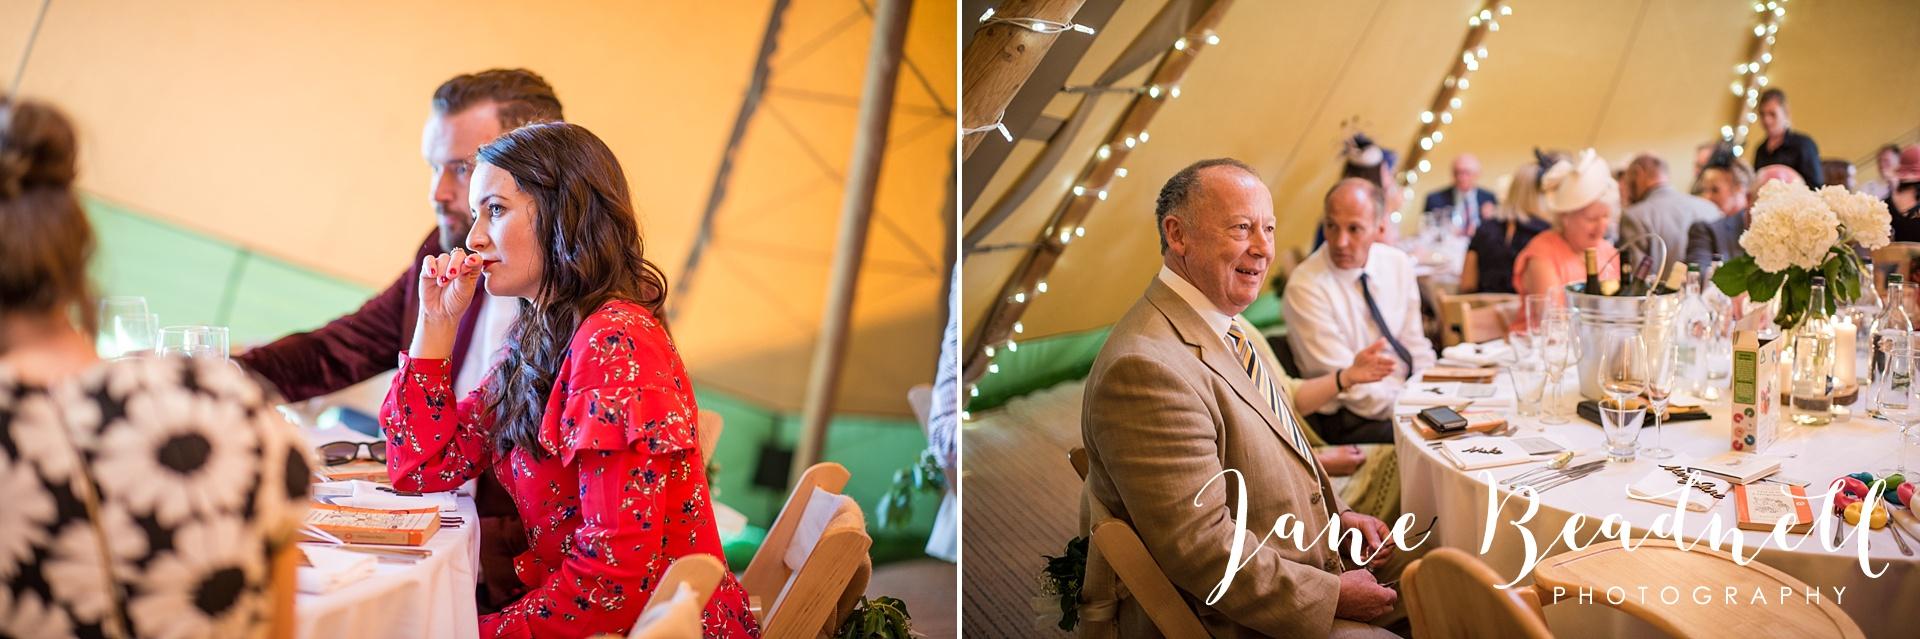 fine-art-wedding-photographer-jane-beadnell-yorkshire-wedding-photographer_0124